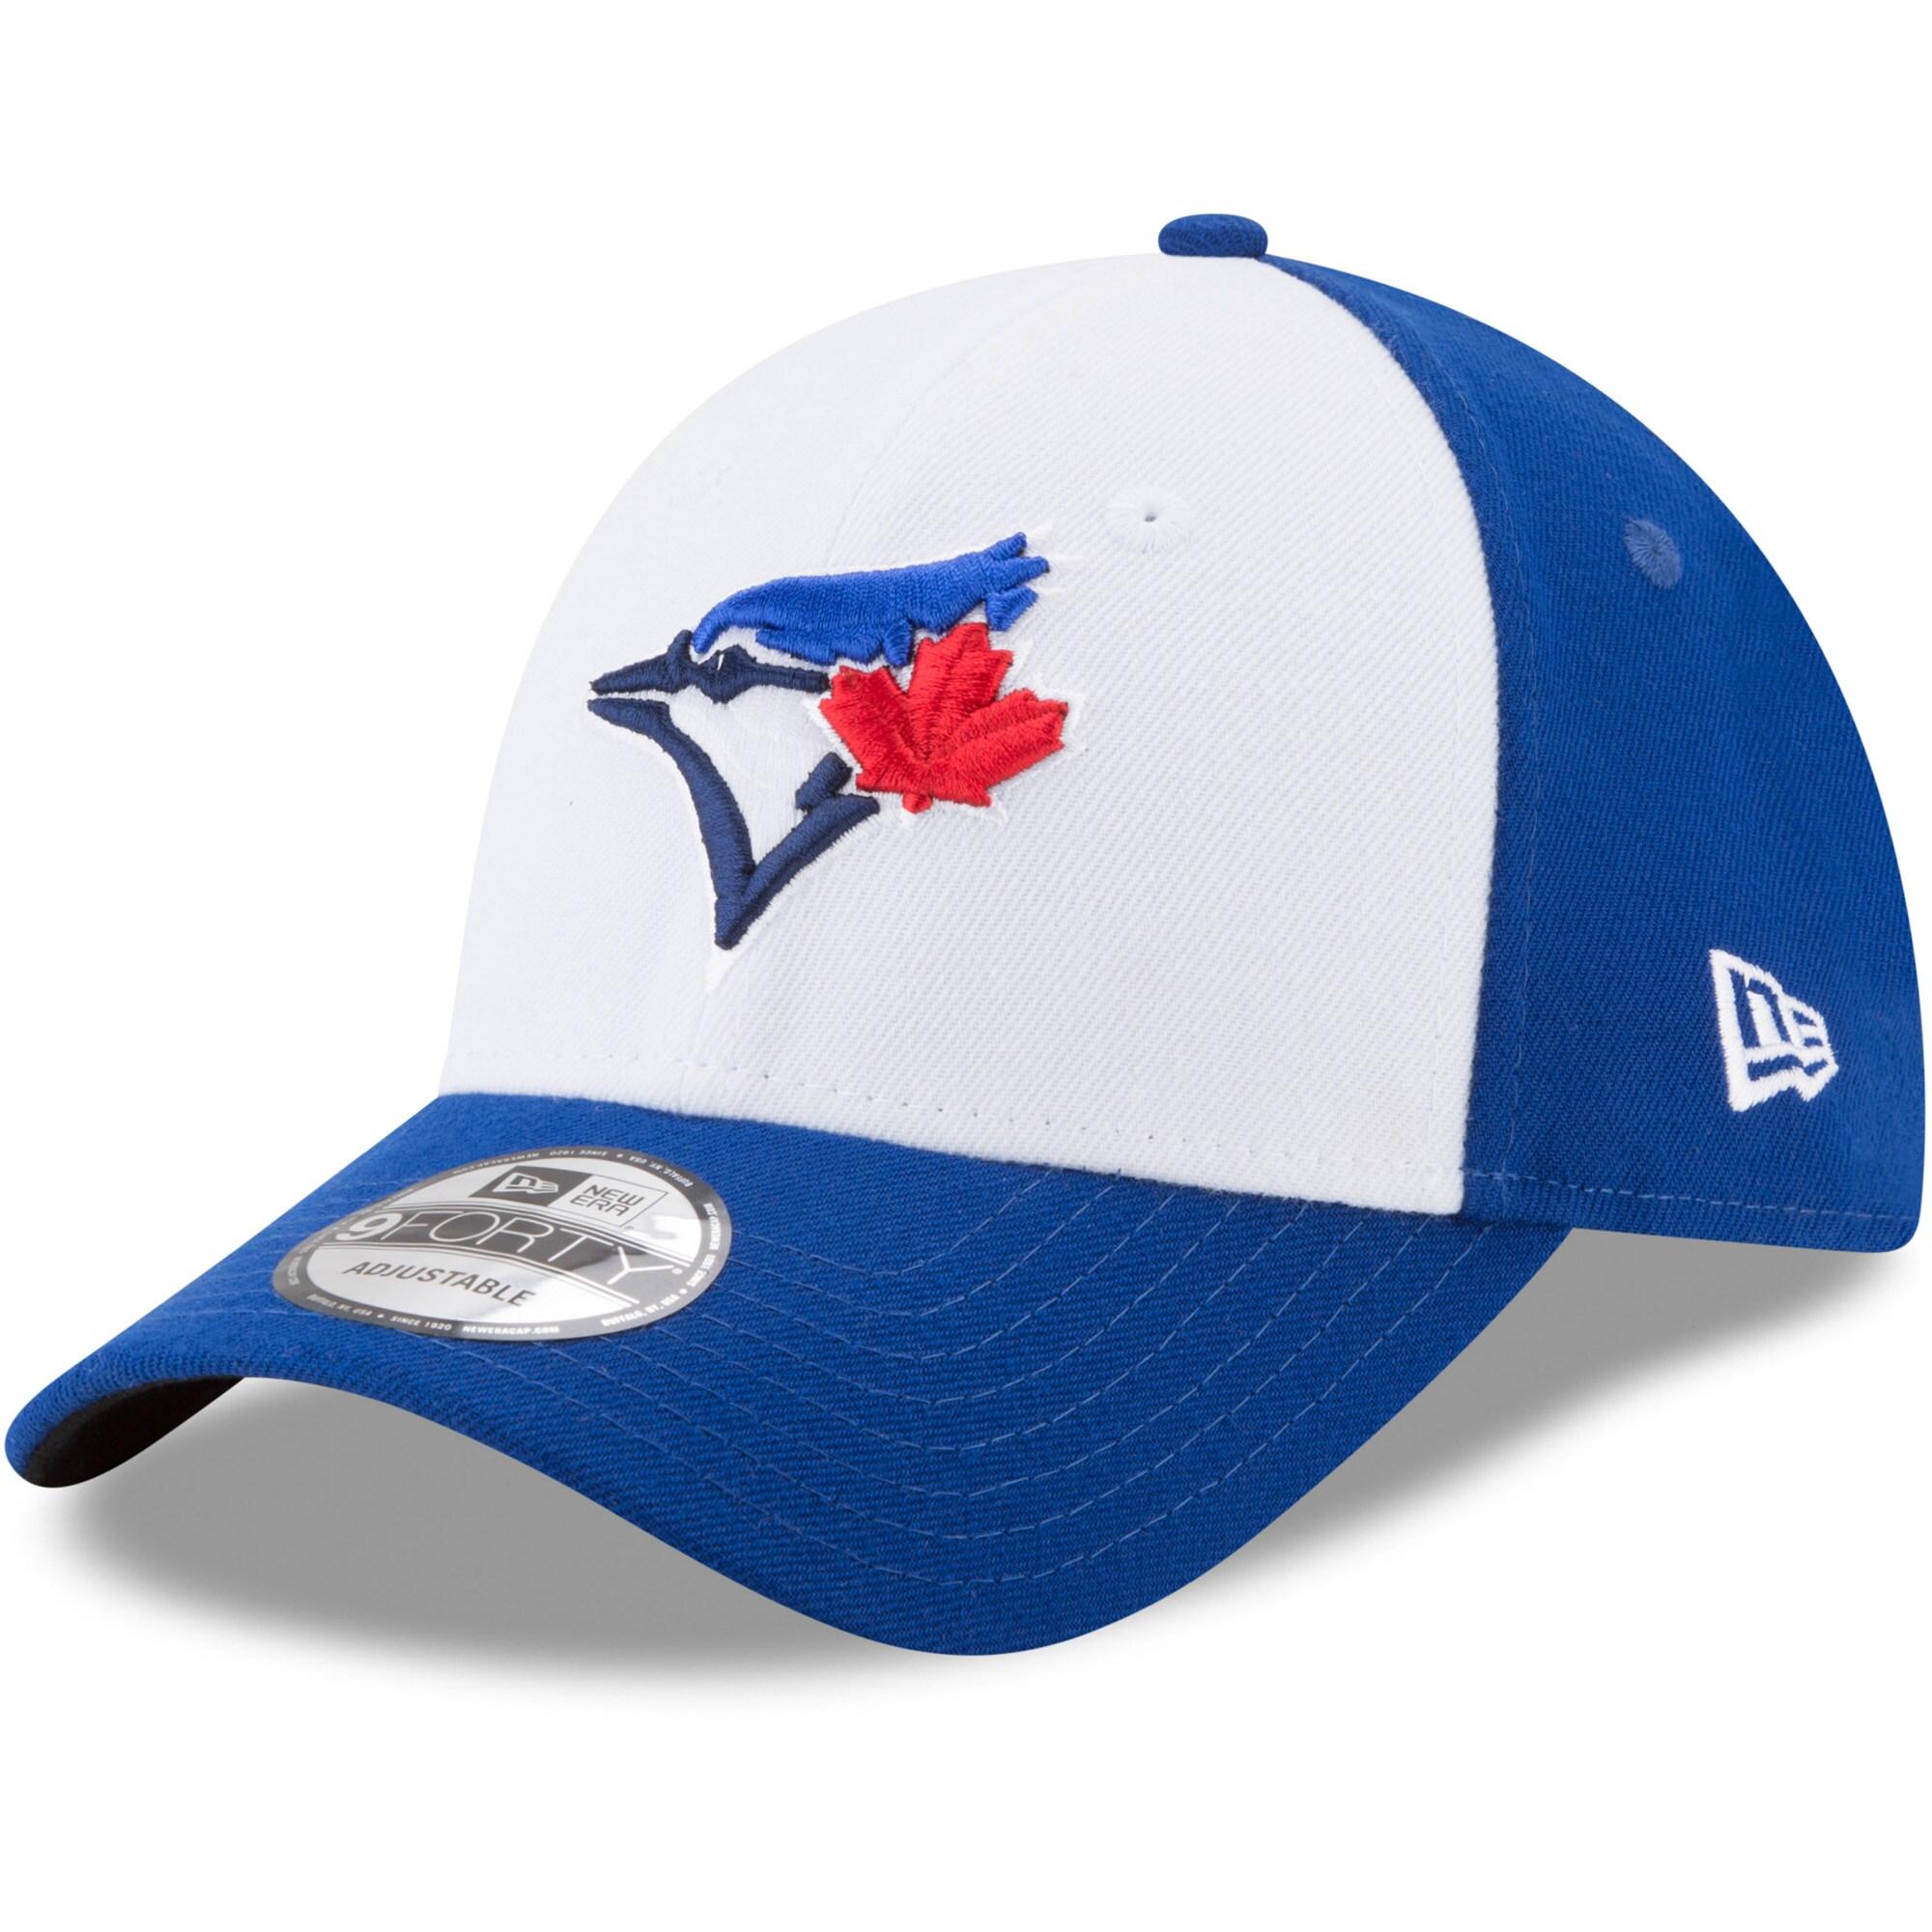 Toronto Blue Jays New Era Alternate 3 The League 9FORTY Adjustable Hat - White/Royal